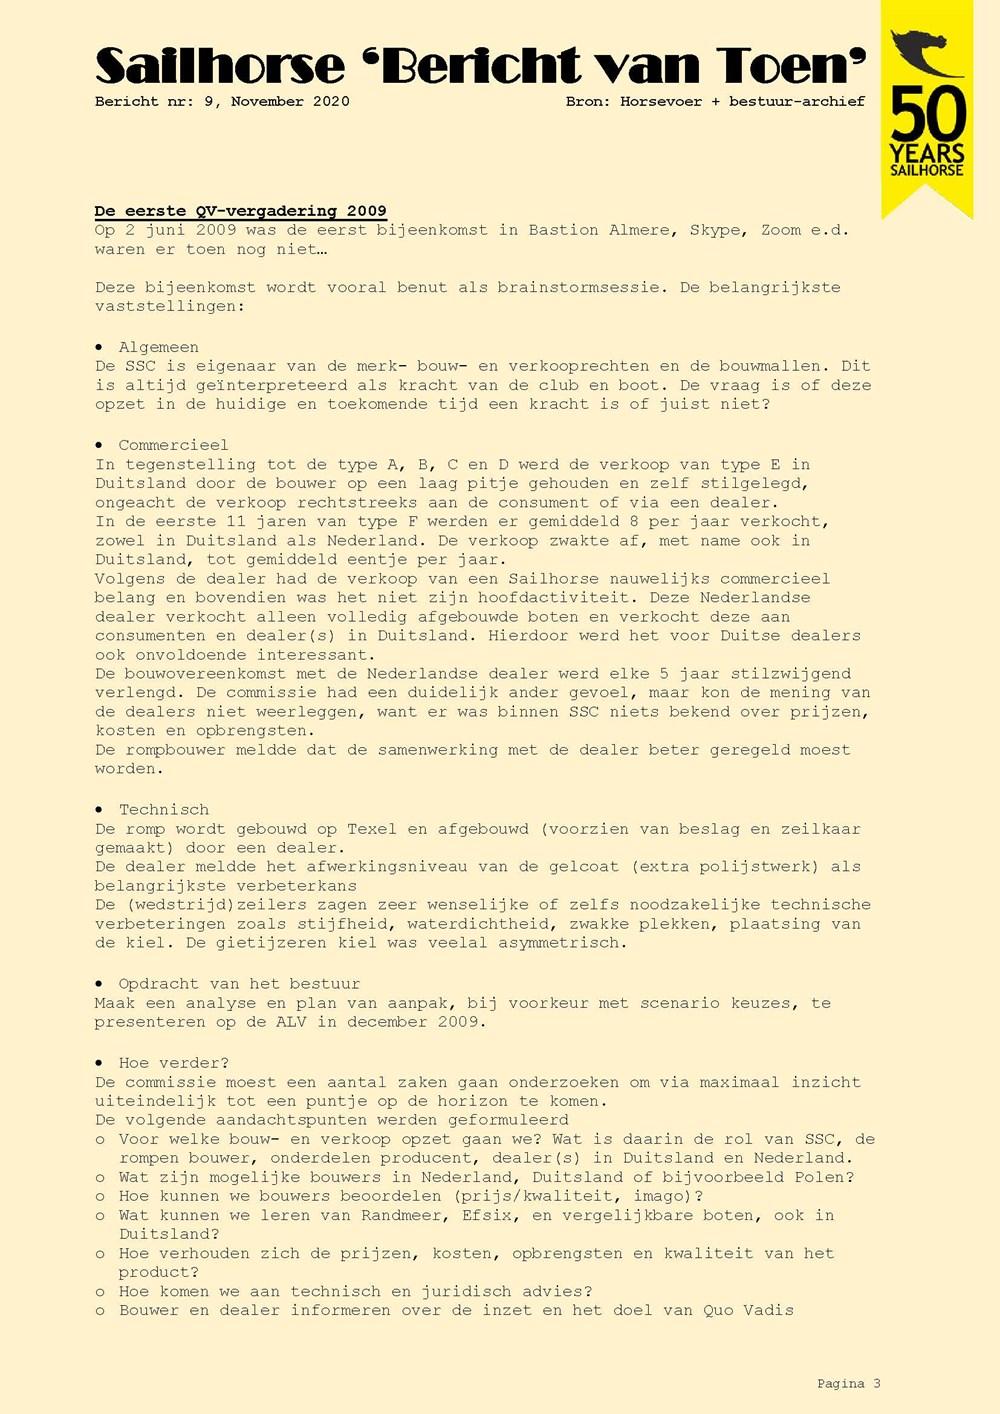 BvT09_Page_03.jpg